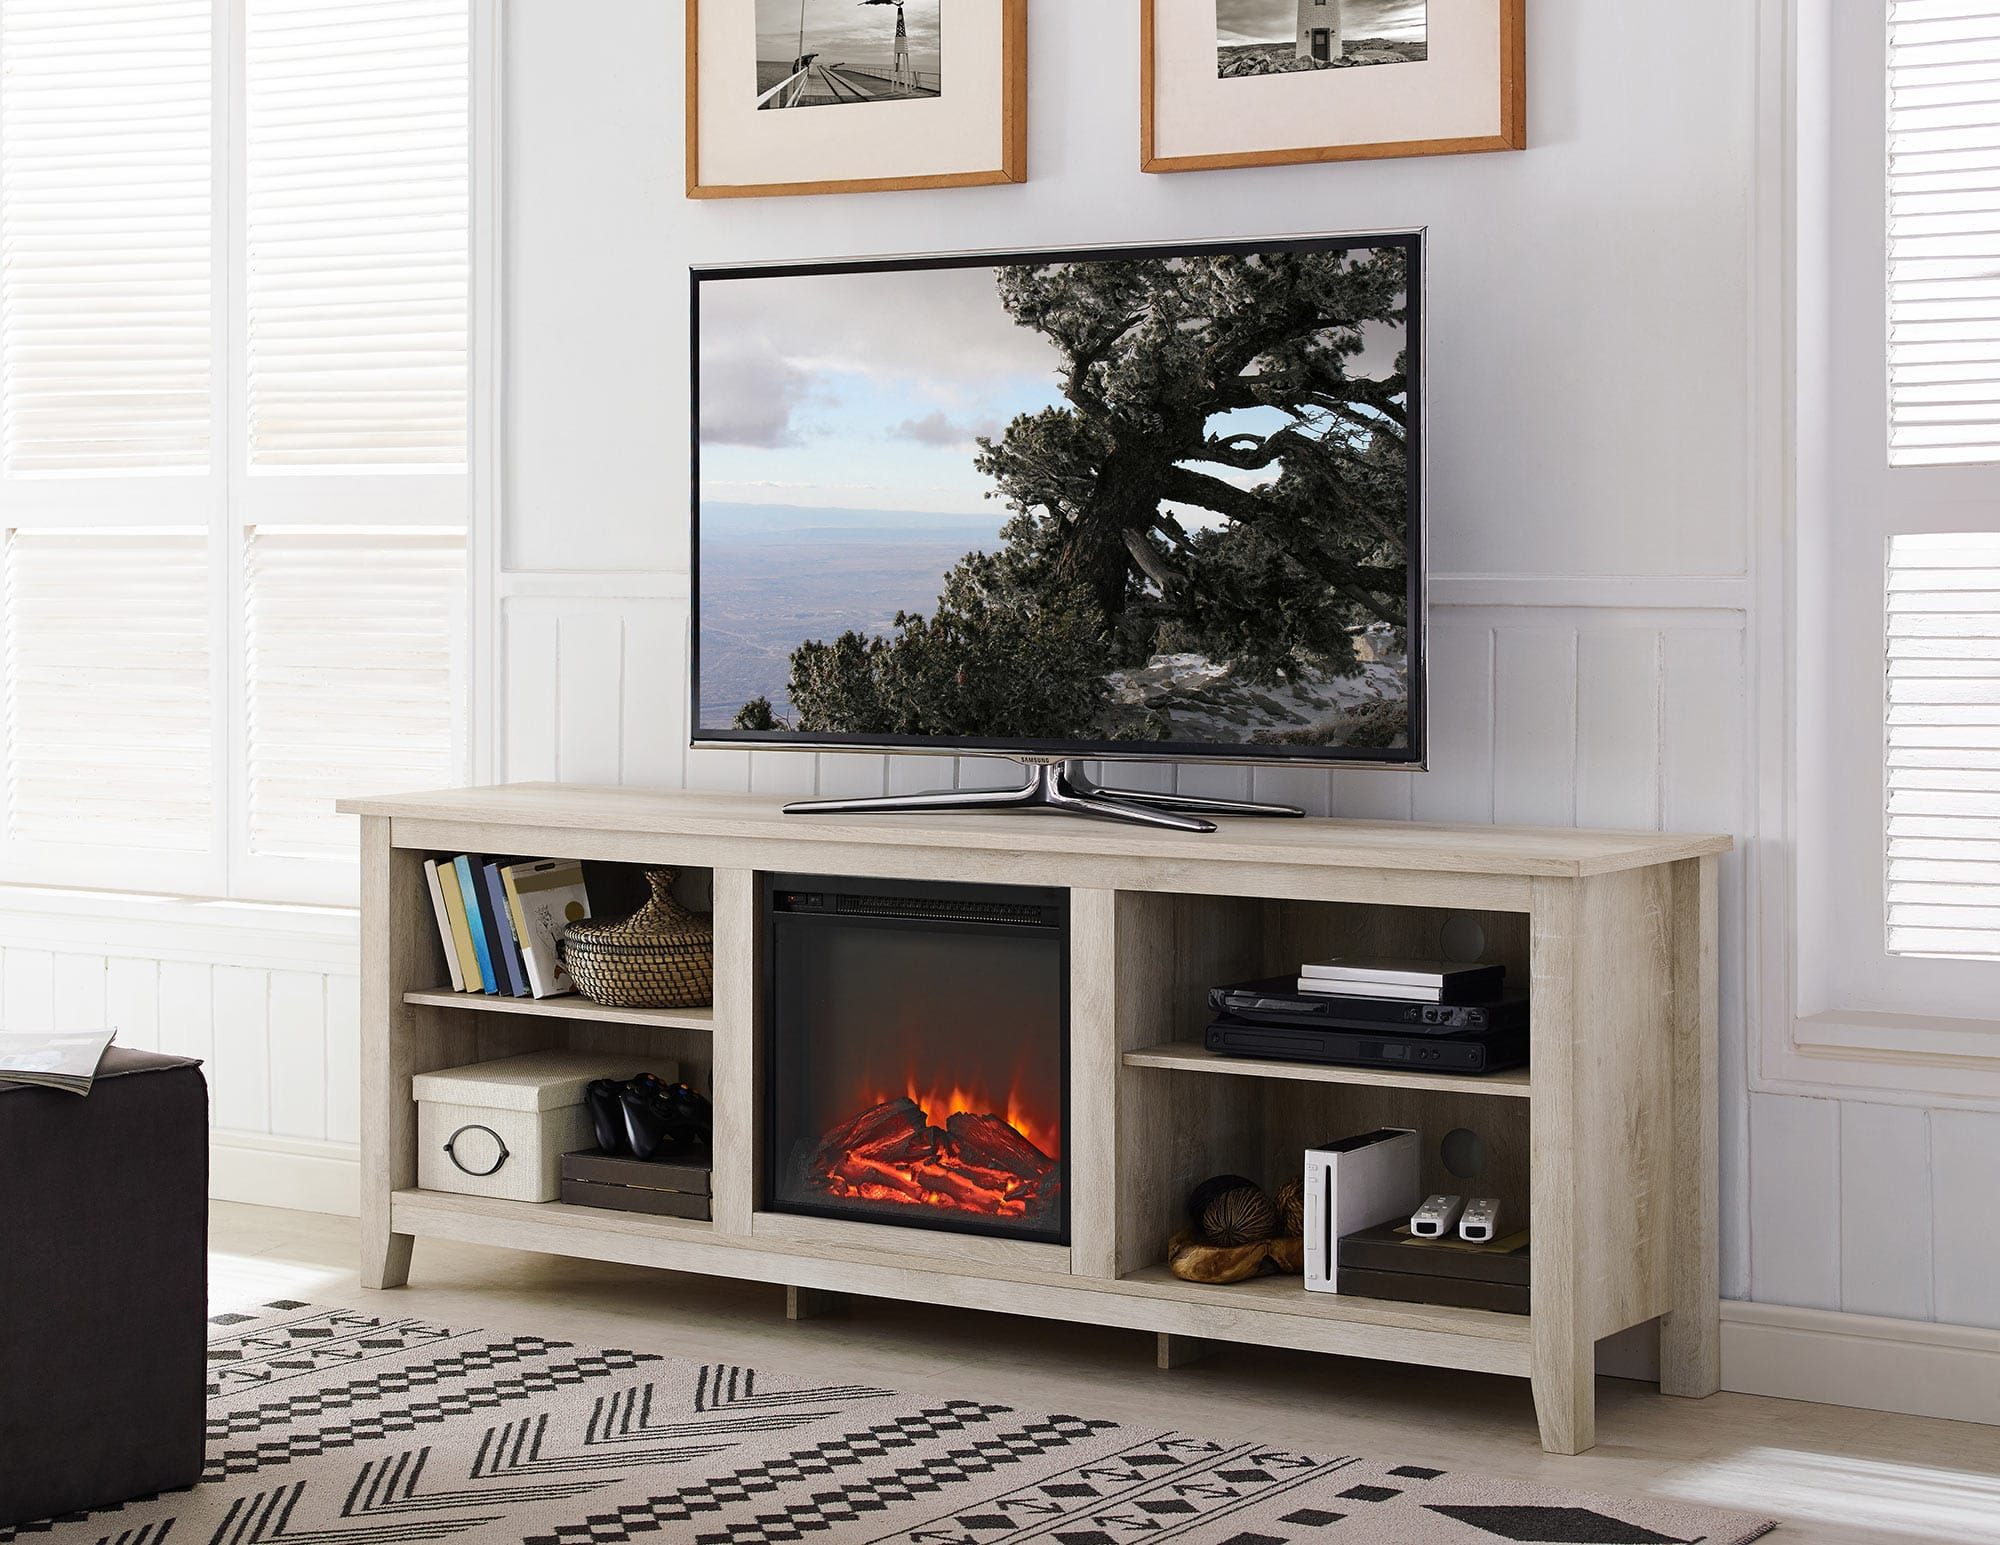 70 Inch Wood Media Tv Stand Console W Fireplace White Oak By Walker Edison